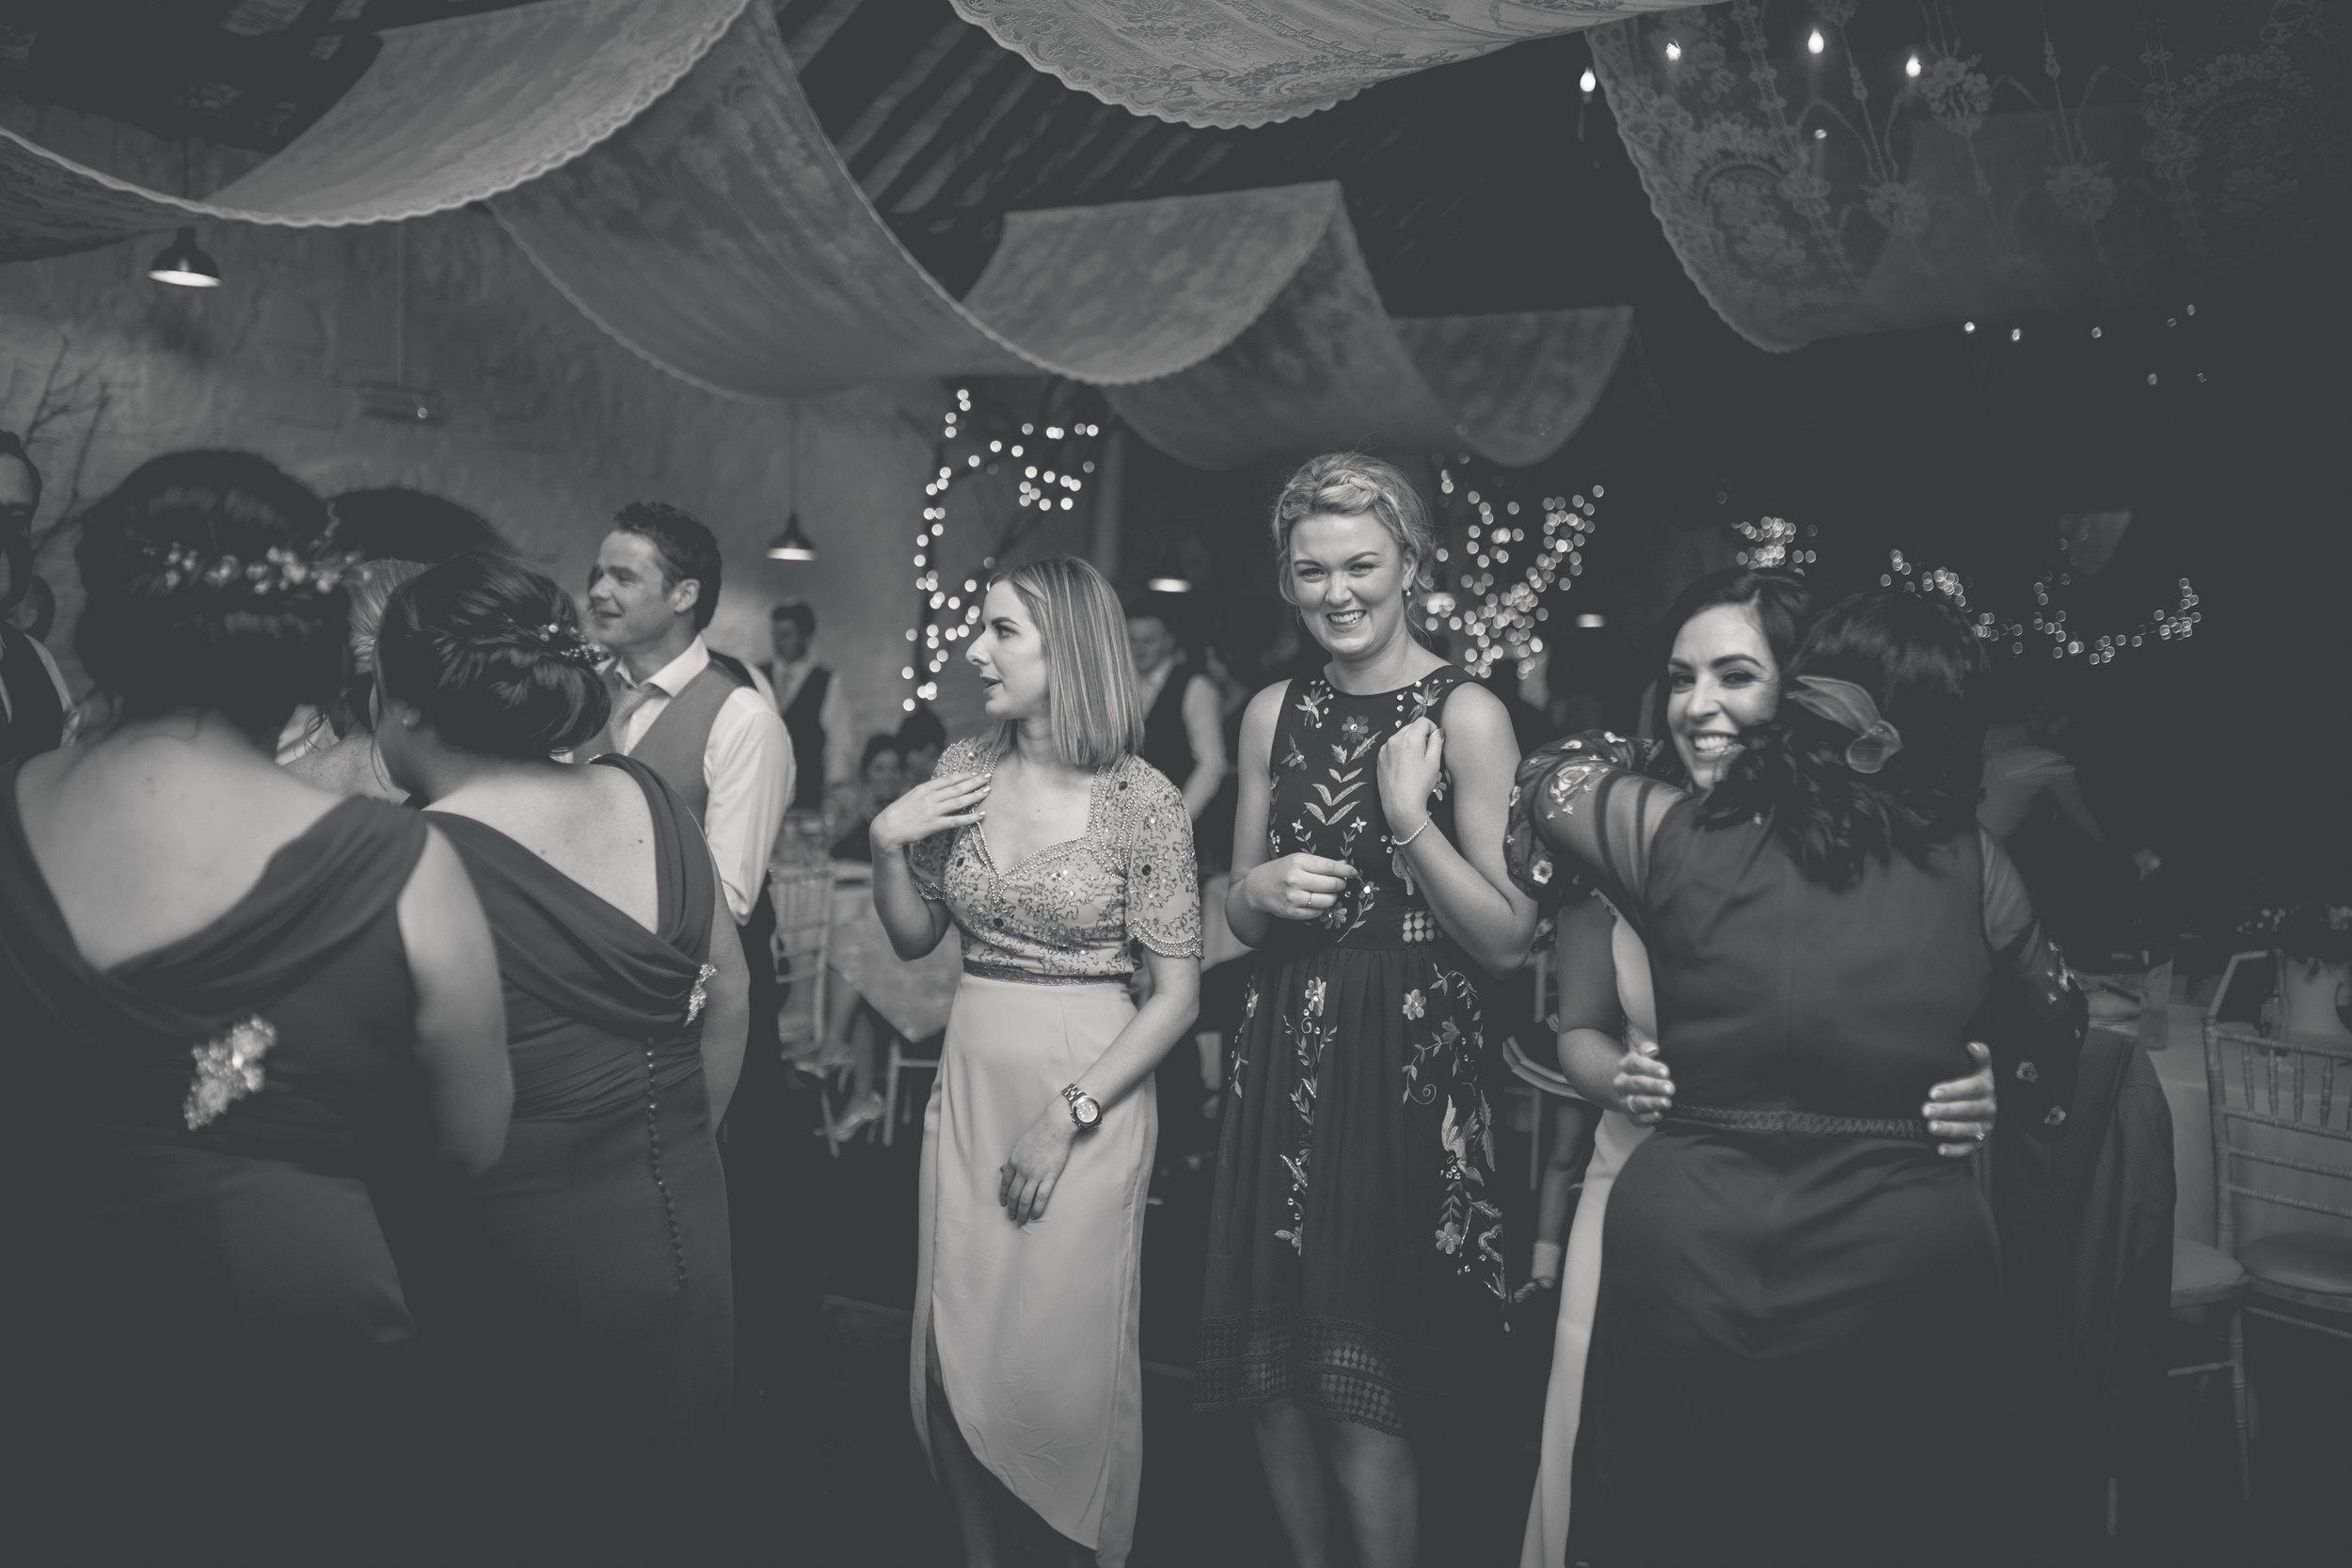 Brian McEwan Wedding Photography | Carol-Annee & Sean | The Dancing-64.jpg